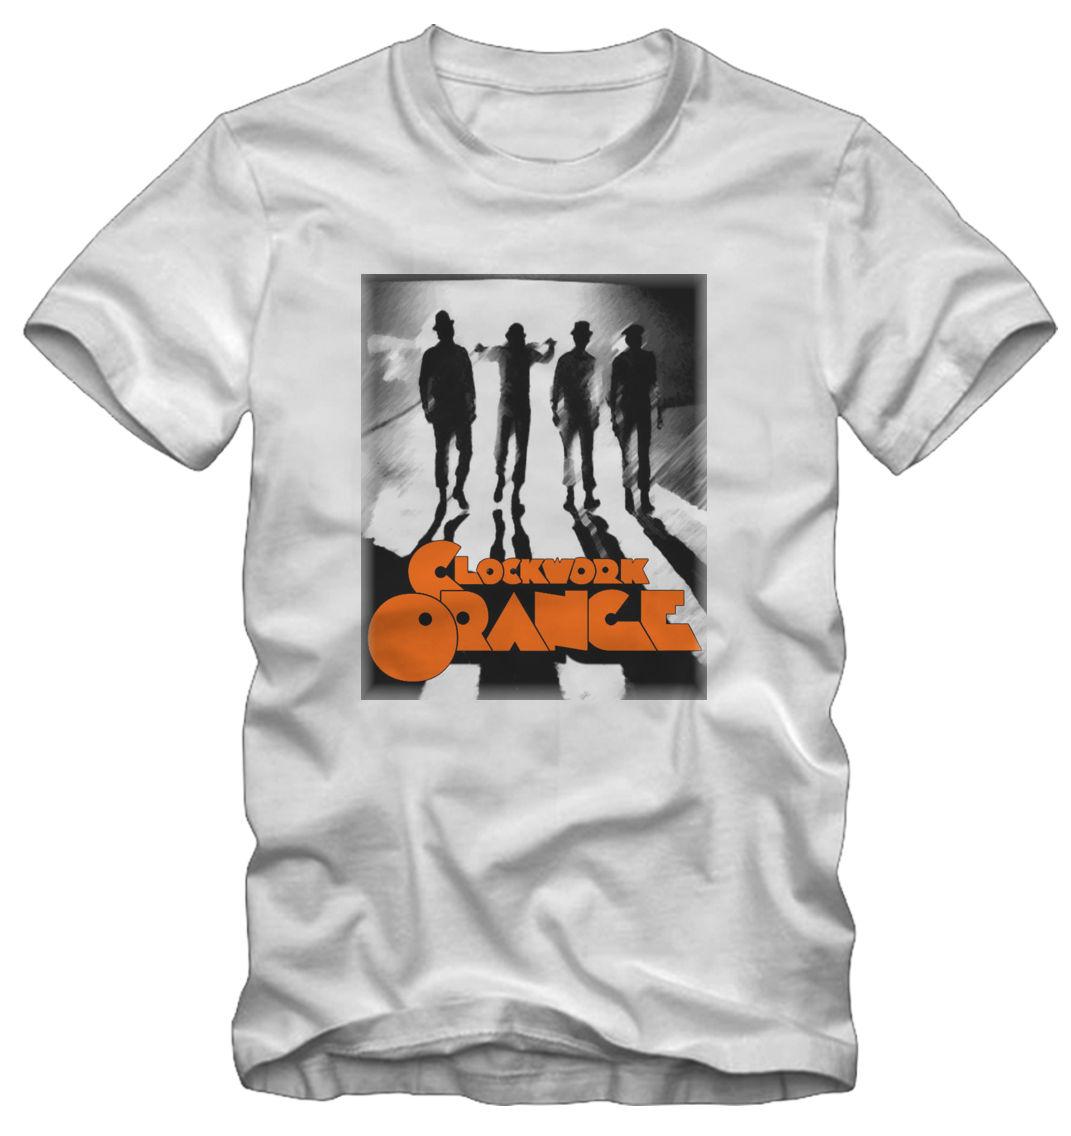 T shirt Maglietta Arancia Meccanica Clockwork Orange Film Cult Harajuku Tops t shirt Fashion Classic Unique free shipping in T Shirts from Men 39 s Clothing